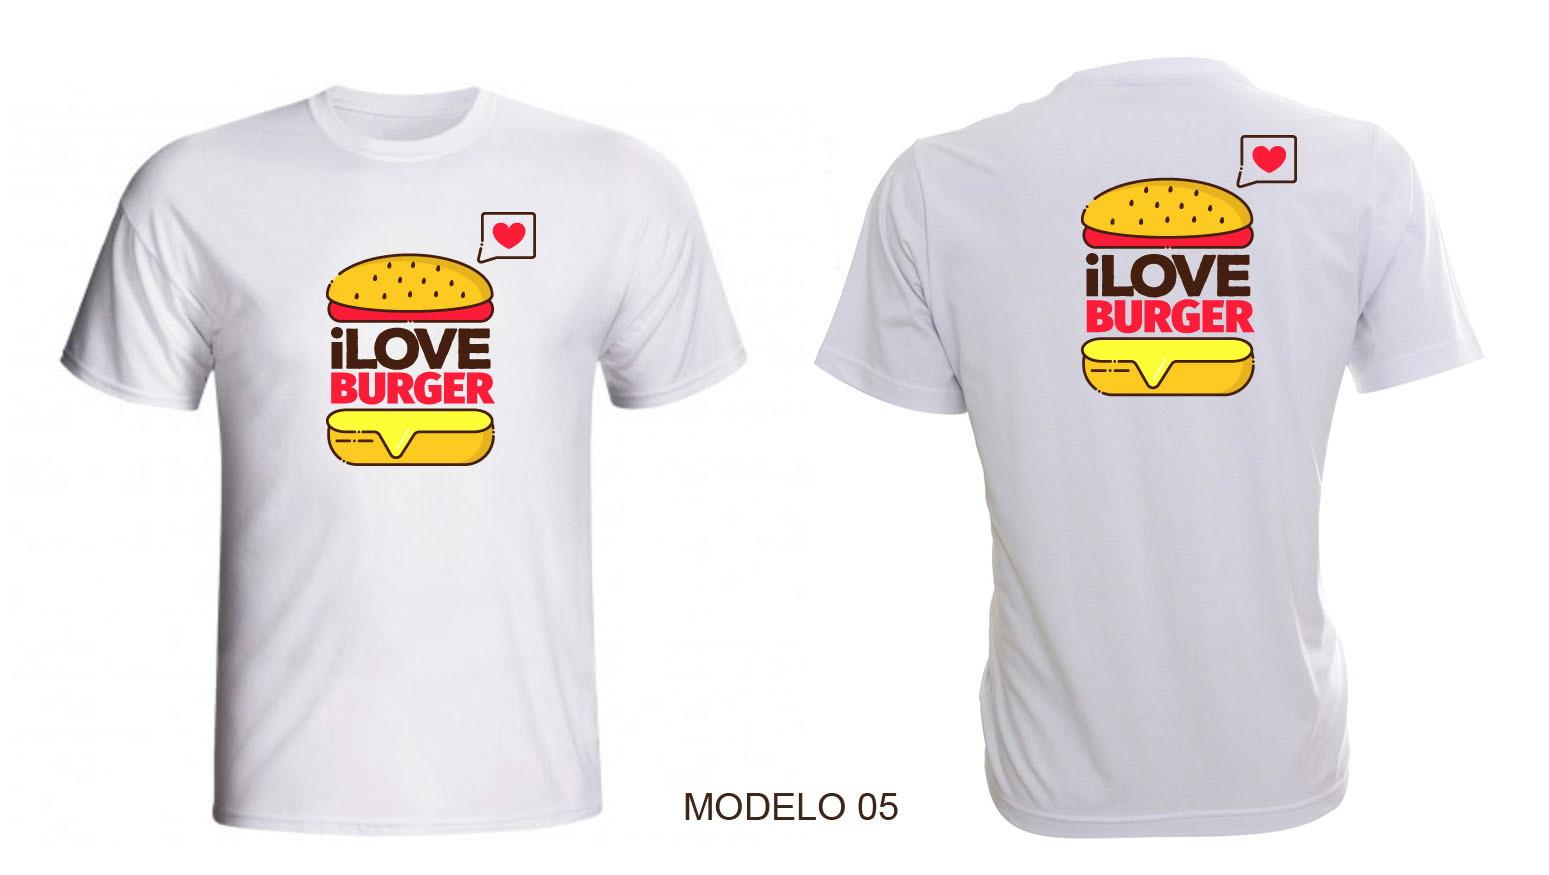 4c182aa730 Camiseta para Lanchonete Personalizada Uniforme com Nome